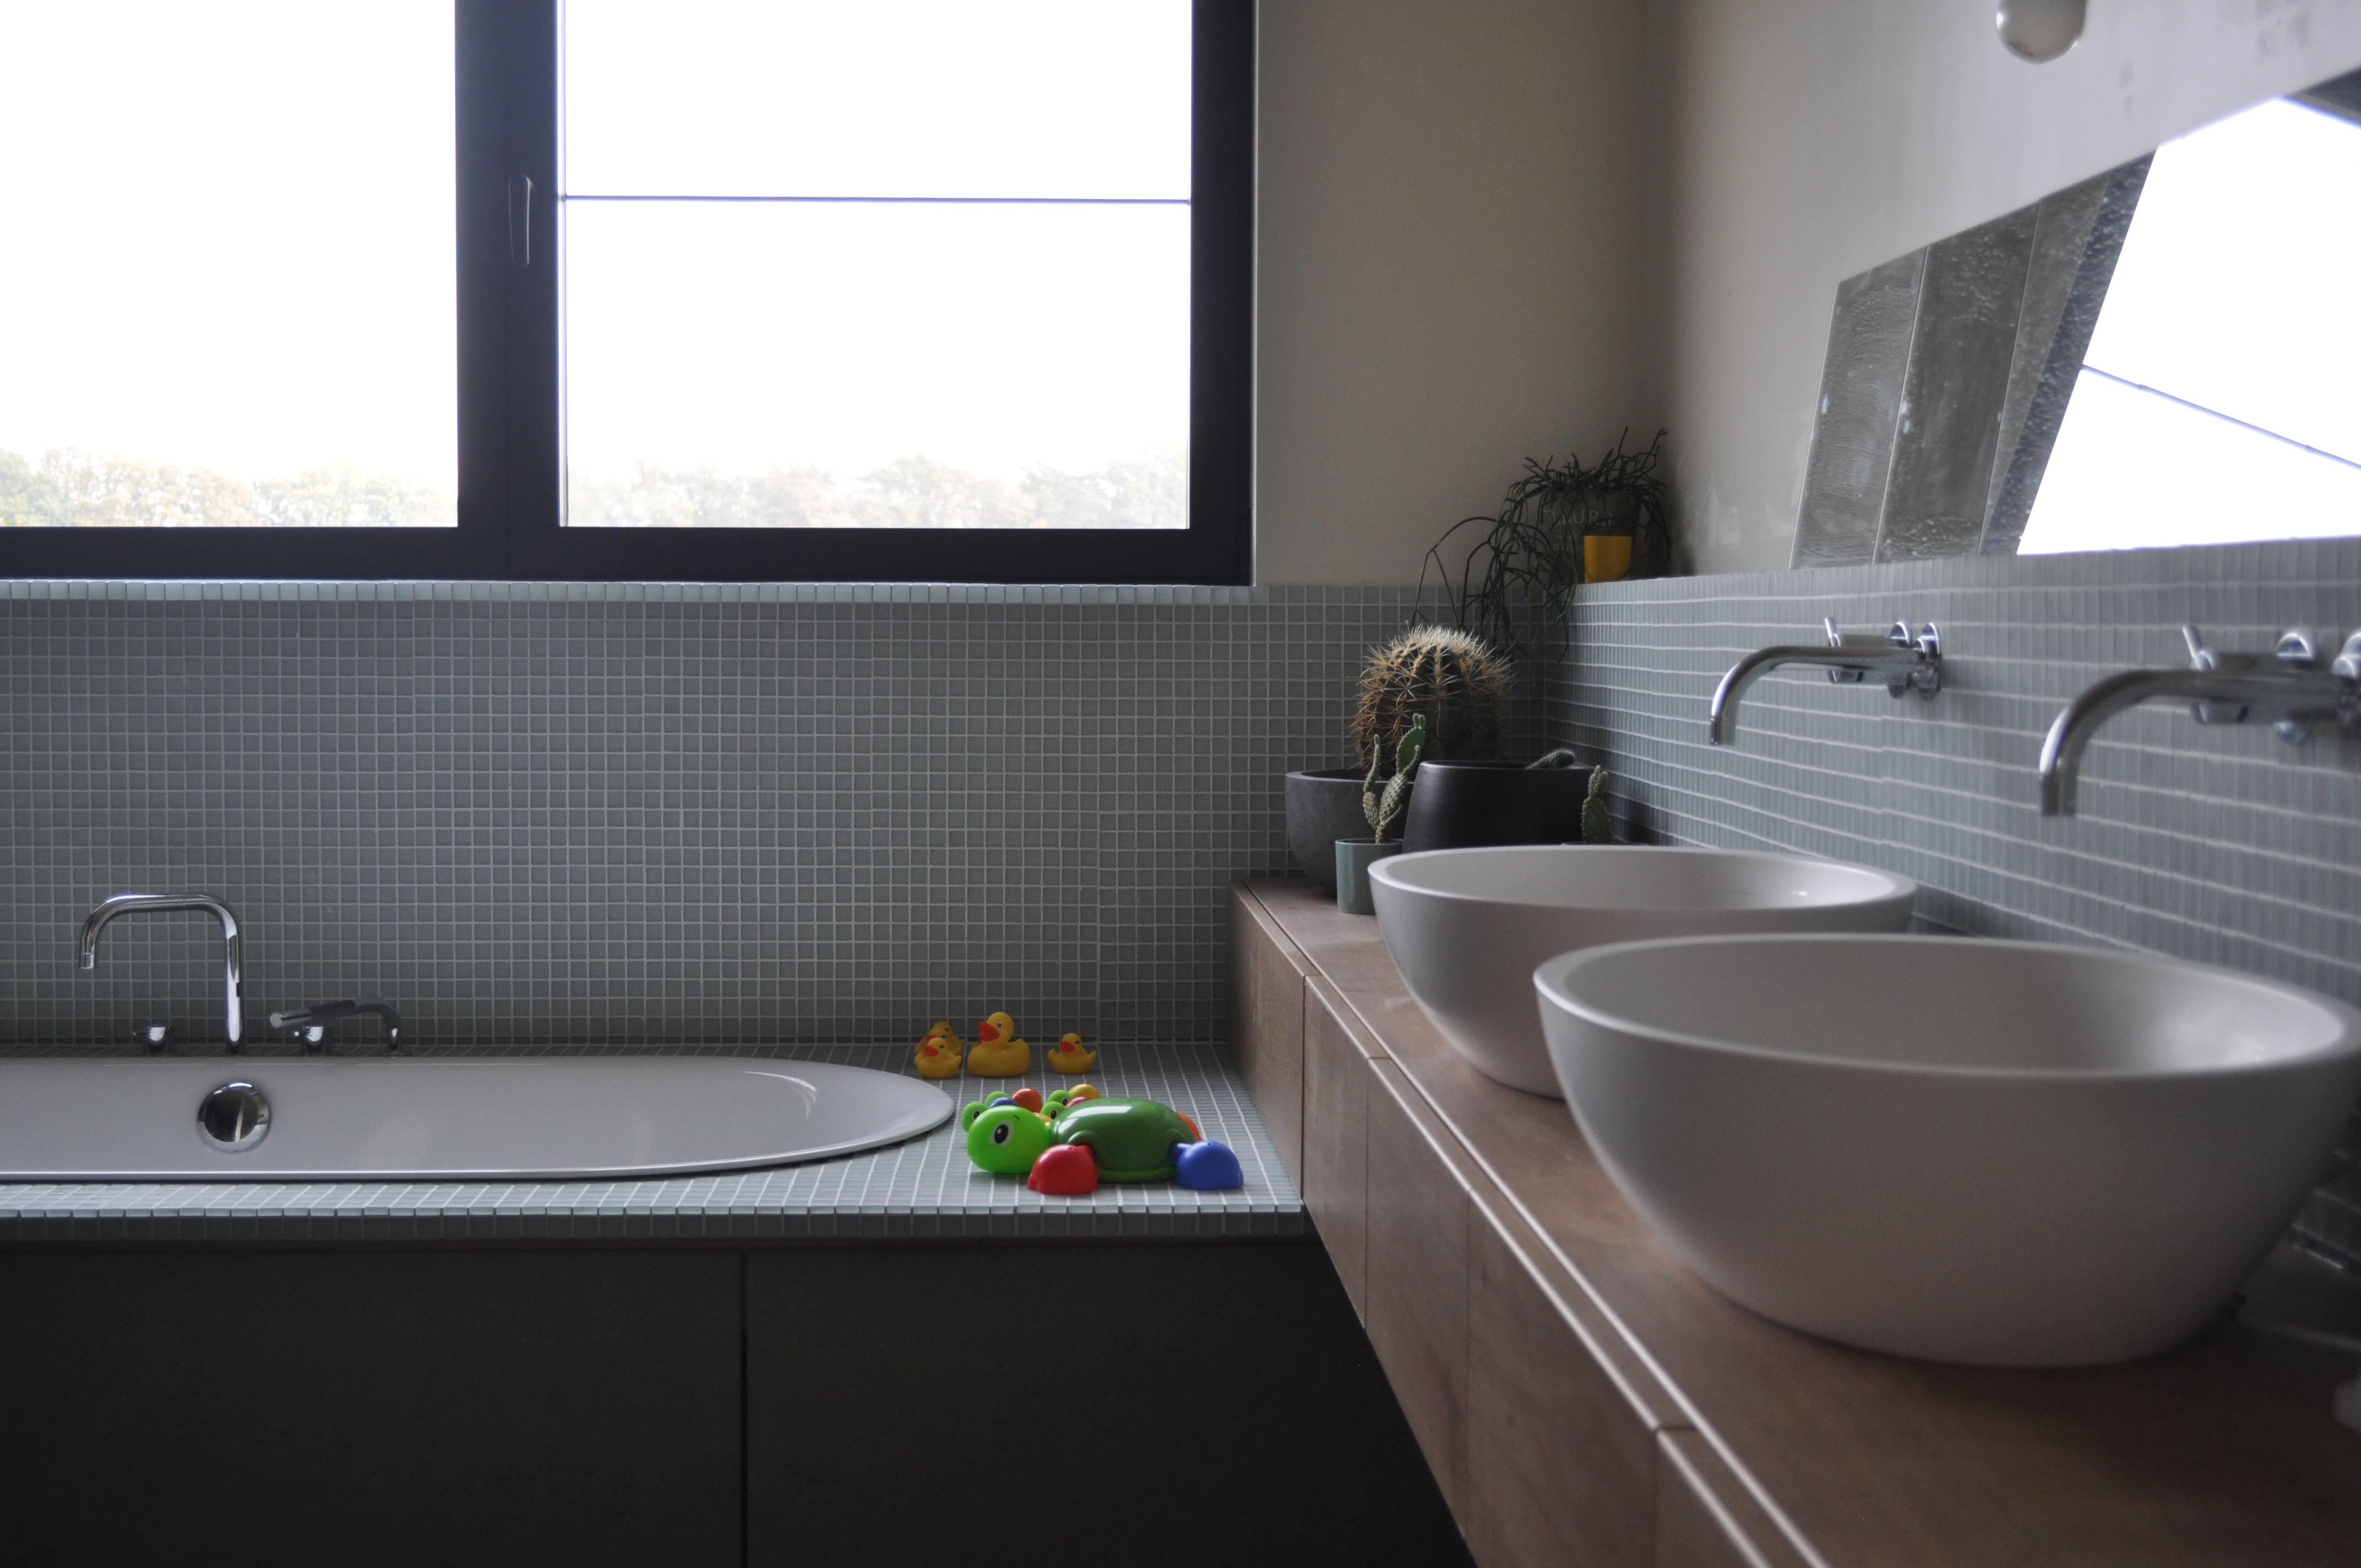 Ontwerp Je Badkamer : Ontwerp badkamer varendonk